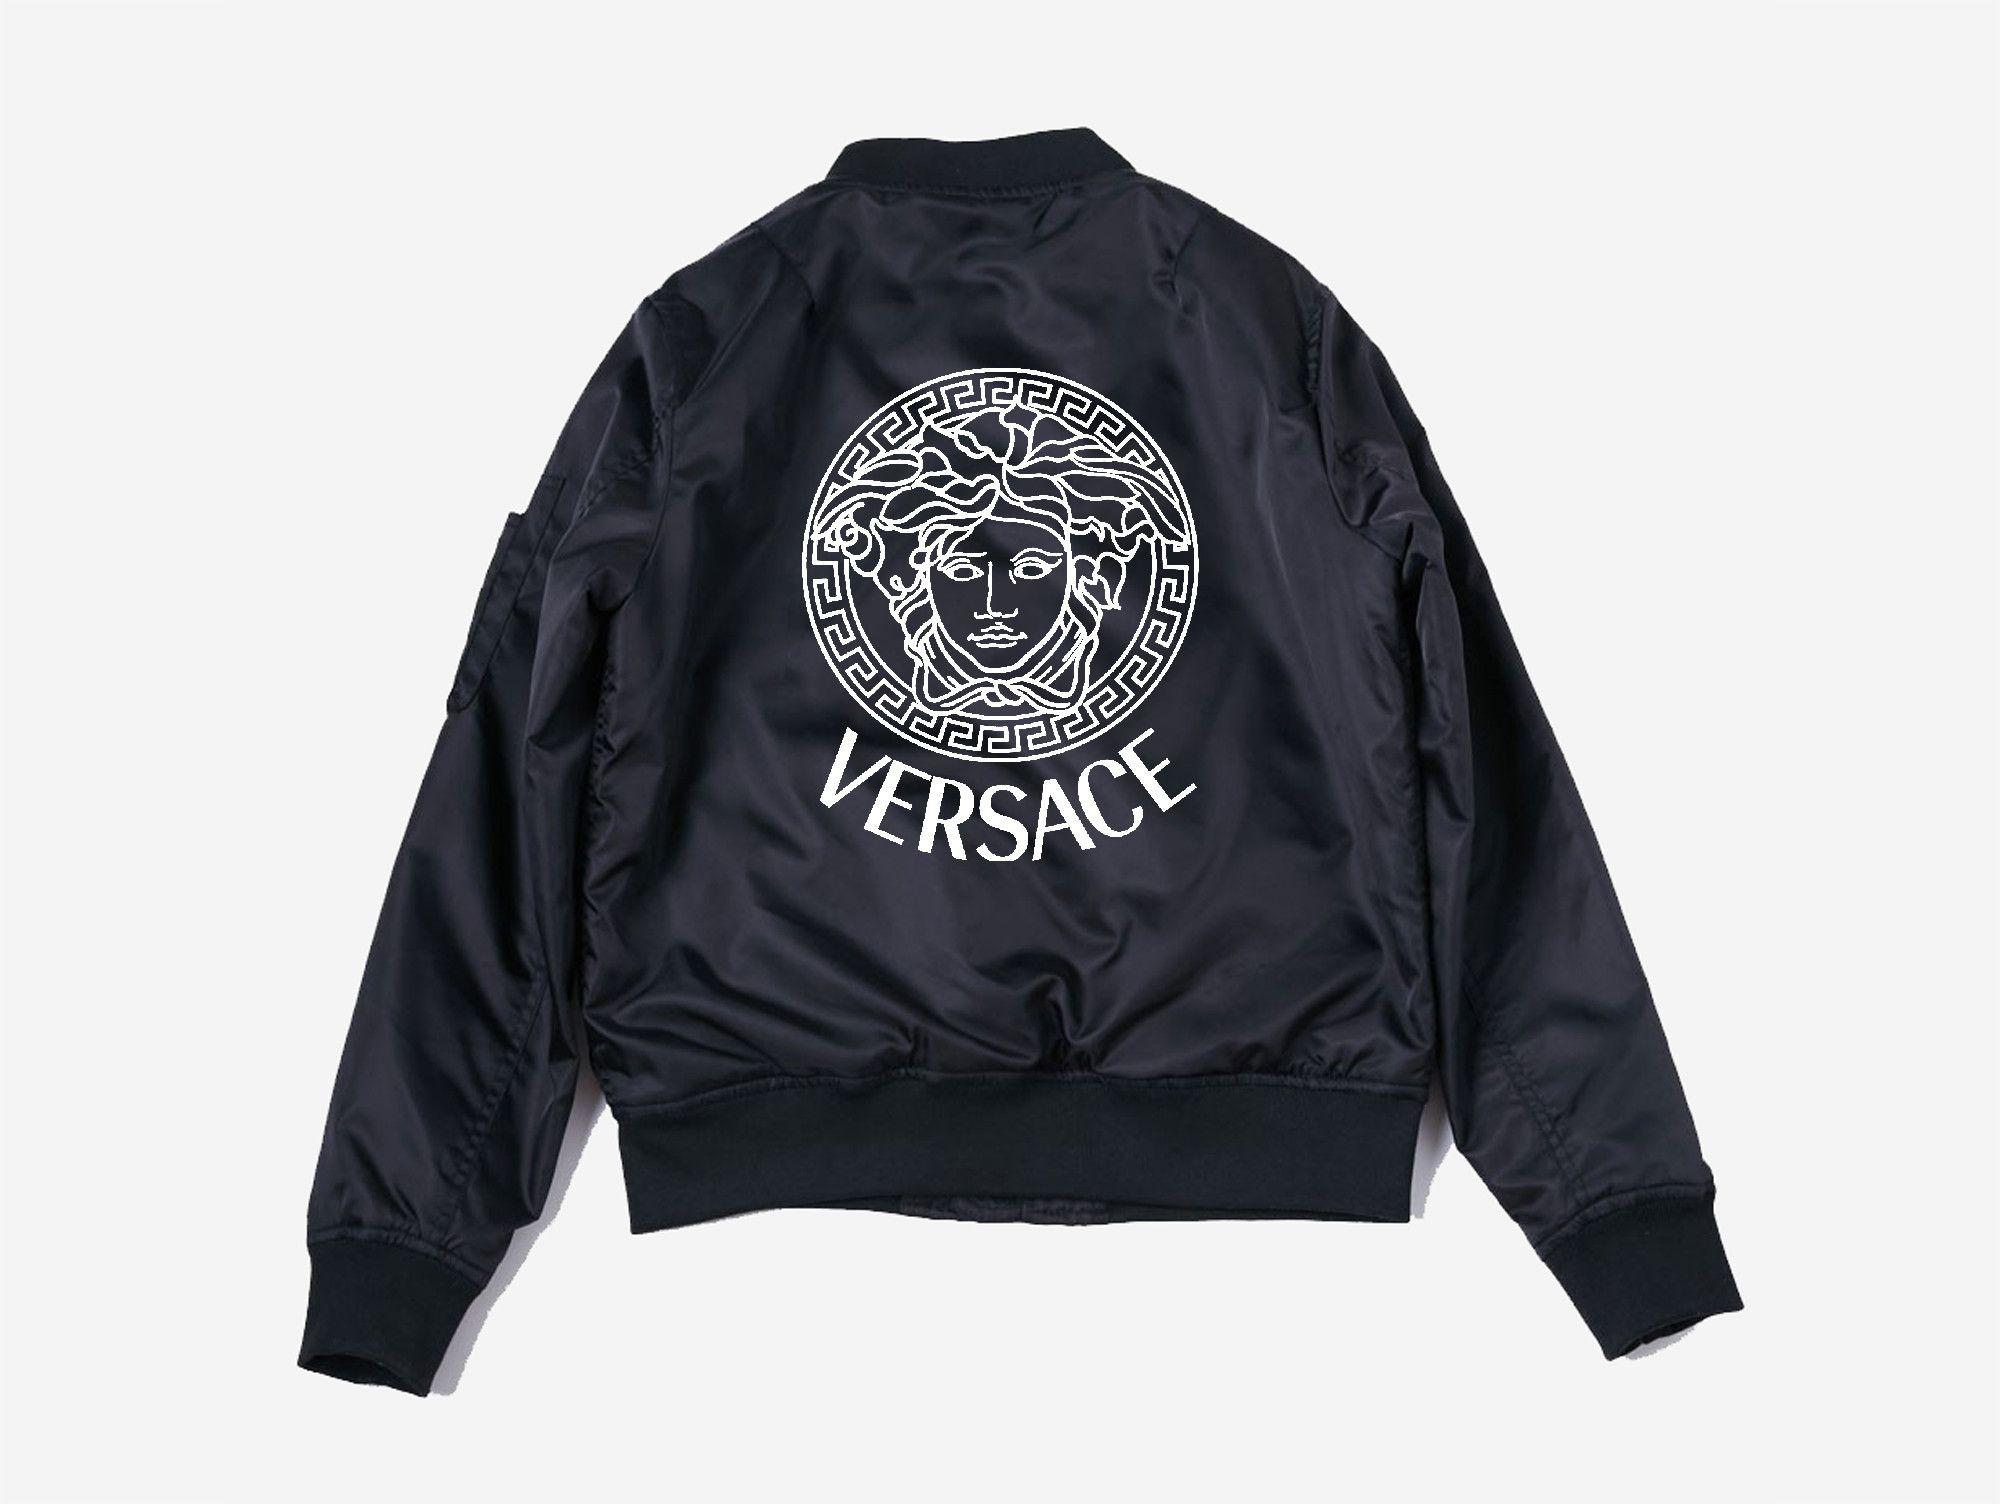 Versace Bomber Jacket Bomber Jacket Black Bomber Jacket Girl Gang